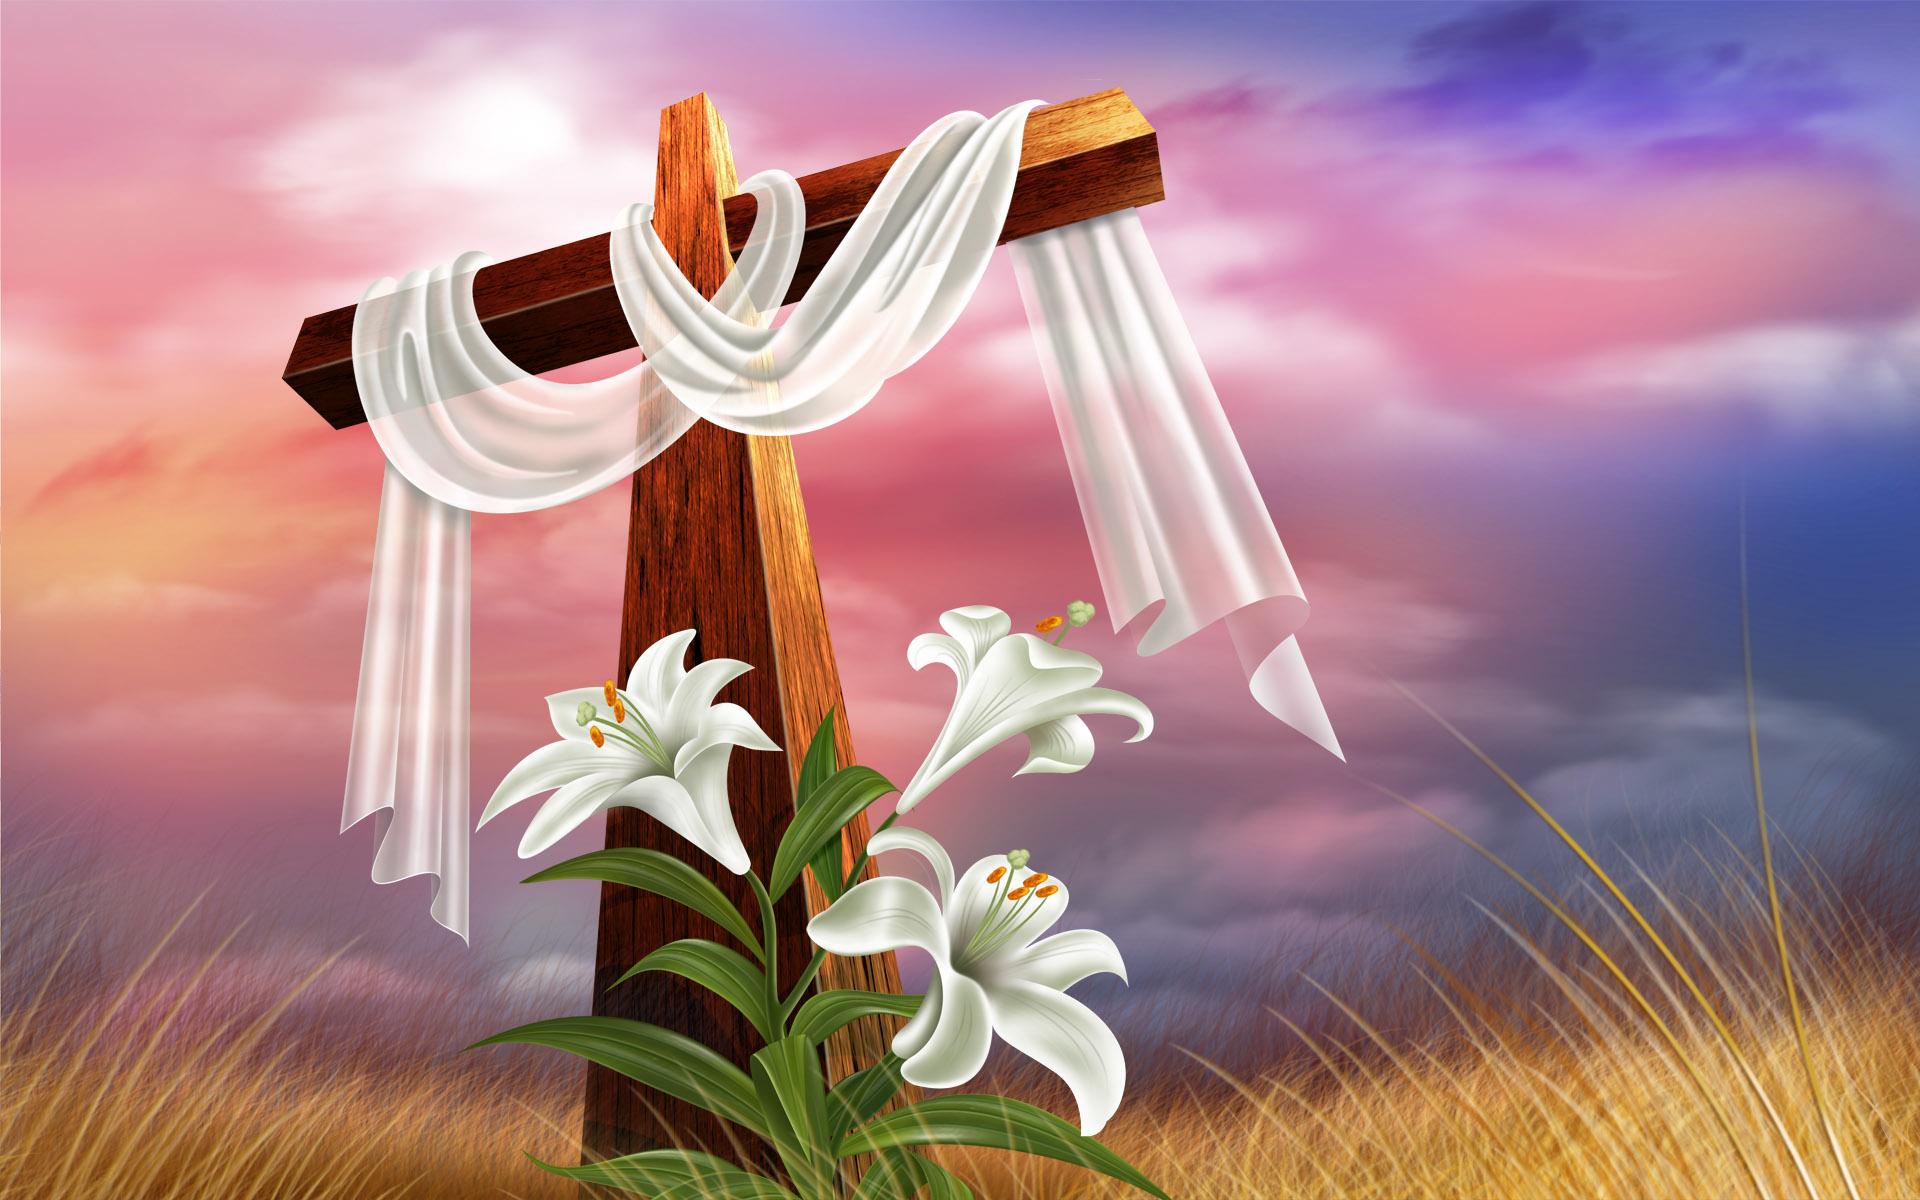 Easter cross wallpaper   609463 1920x1200